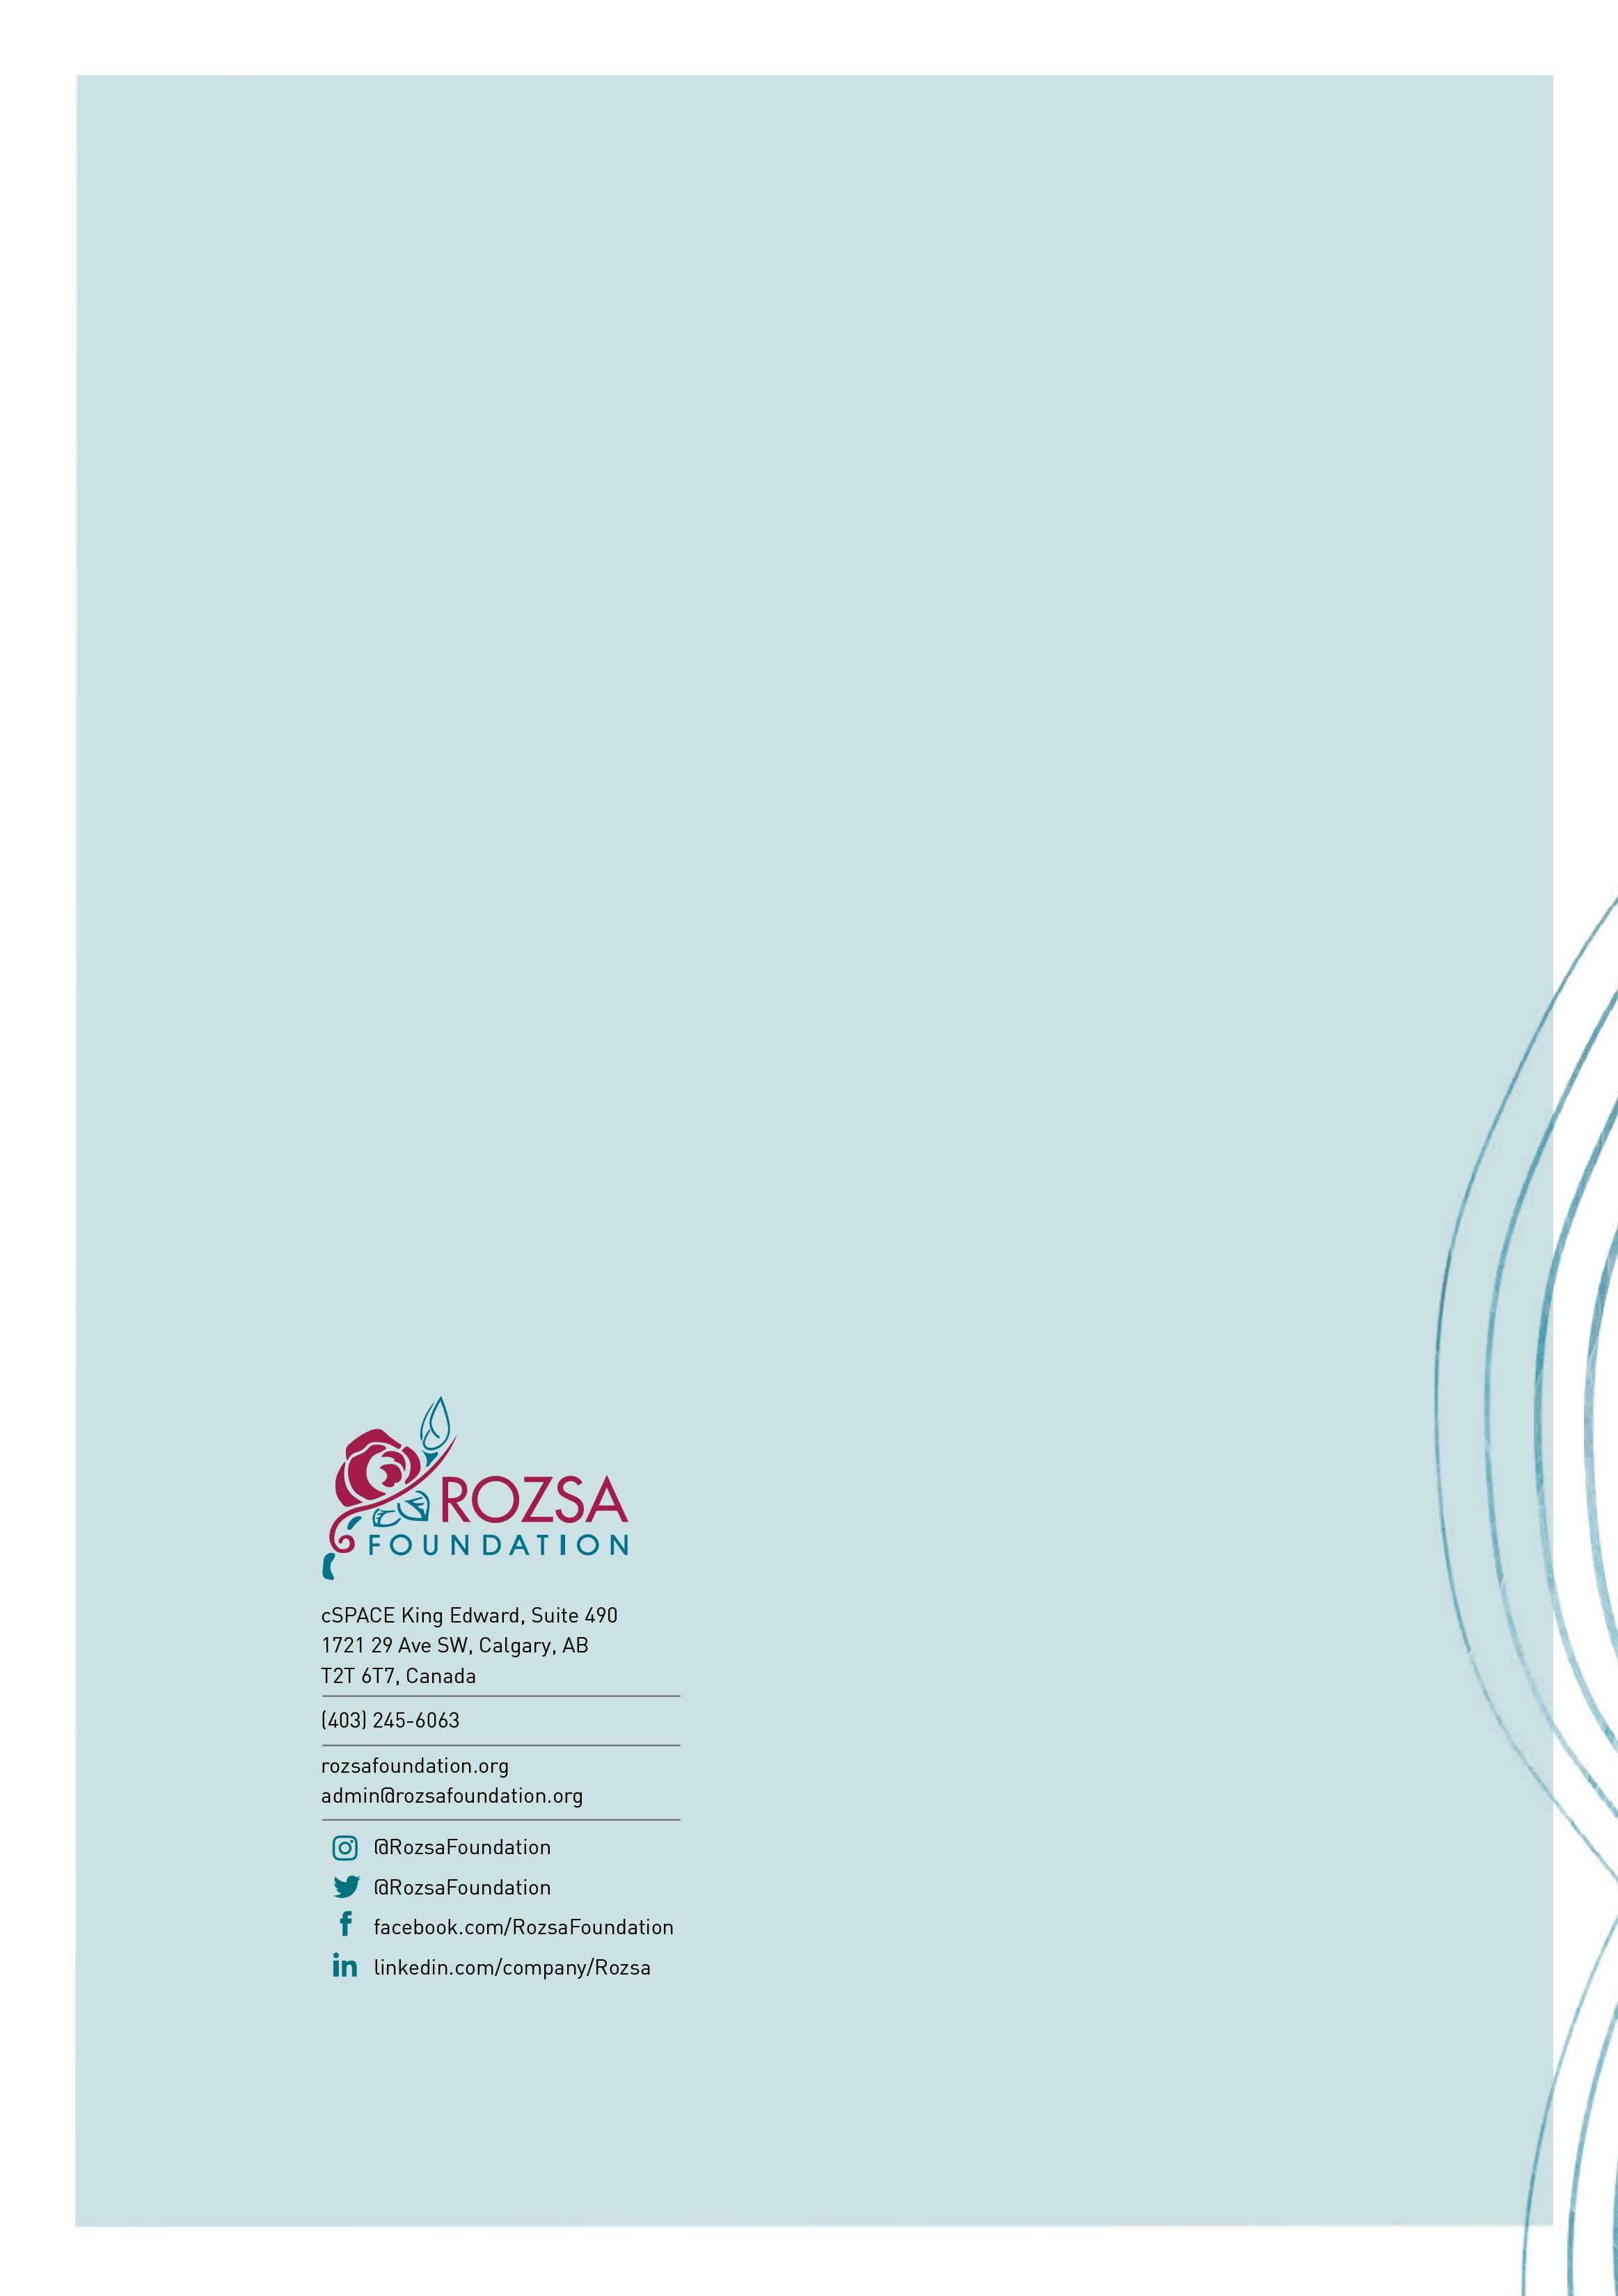 2018 Rozsa Foundation Annual Report-20